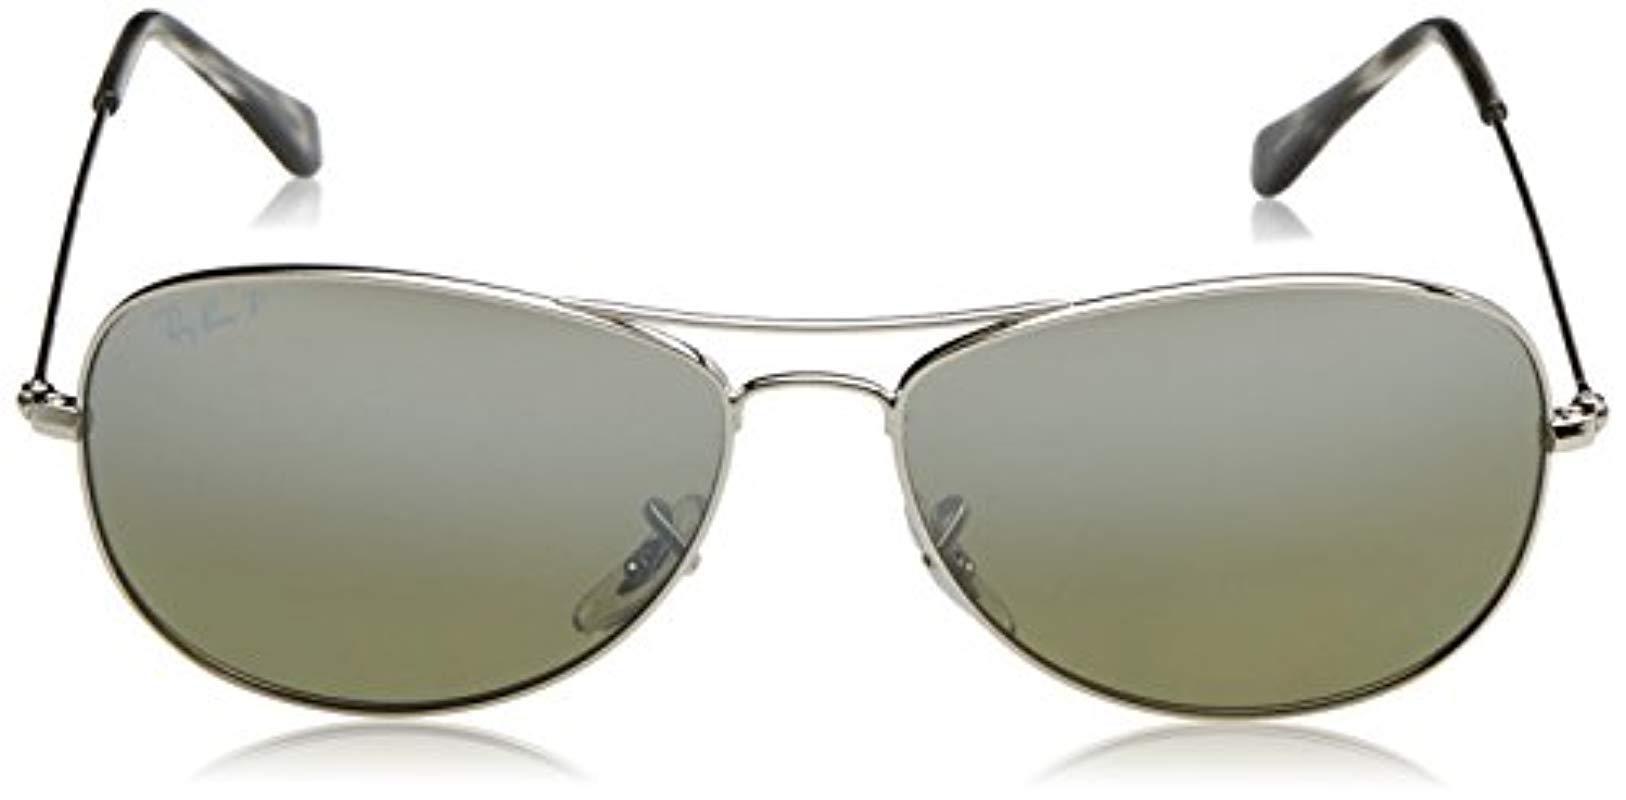 fbd83a356d1 Ray-Ban - Metallic Rb3562 Chromance Lens Pilot Sunglasses - Lyst. View  fullscreen